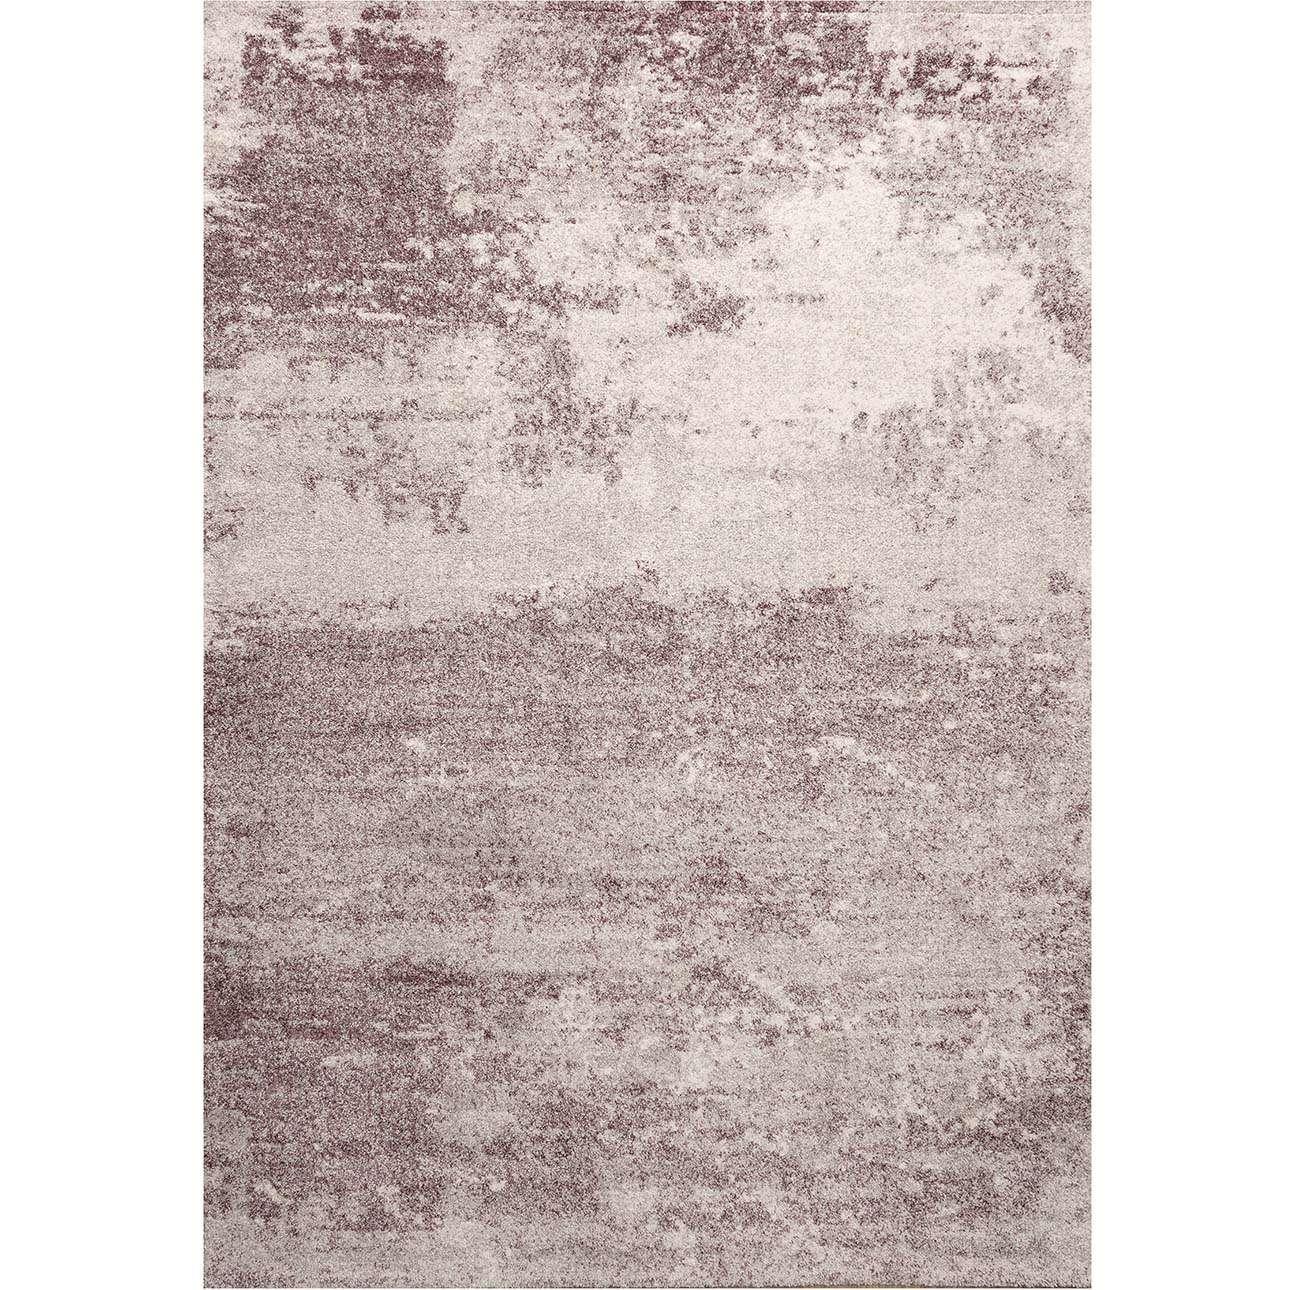 Koberec Softness silver/lavender 200x290cm